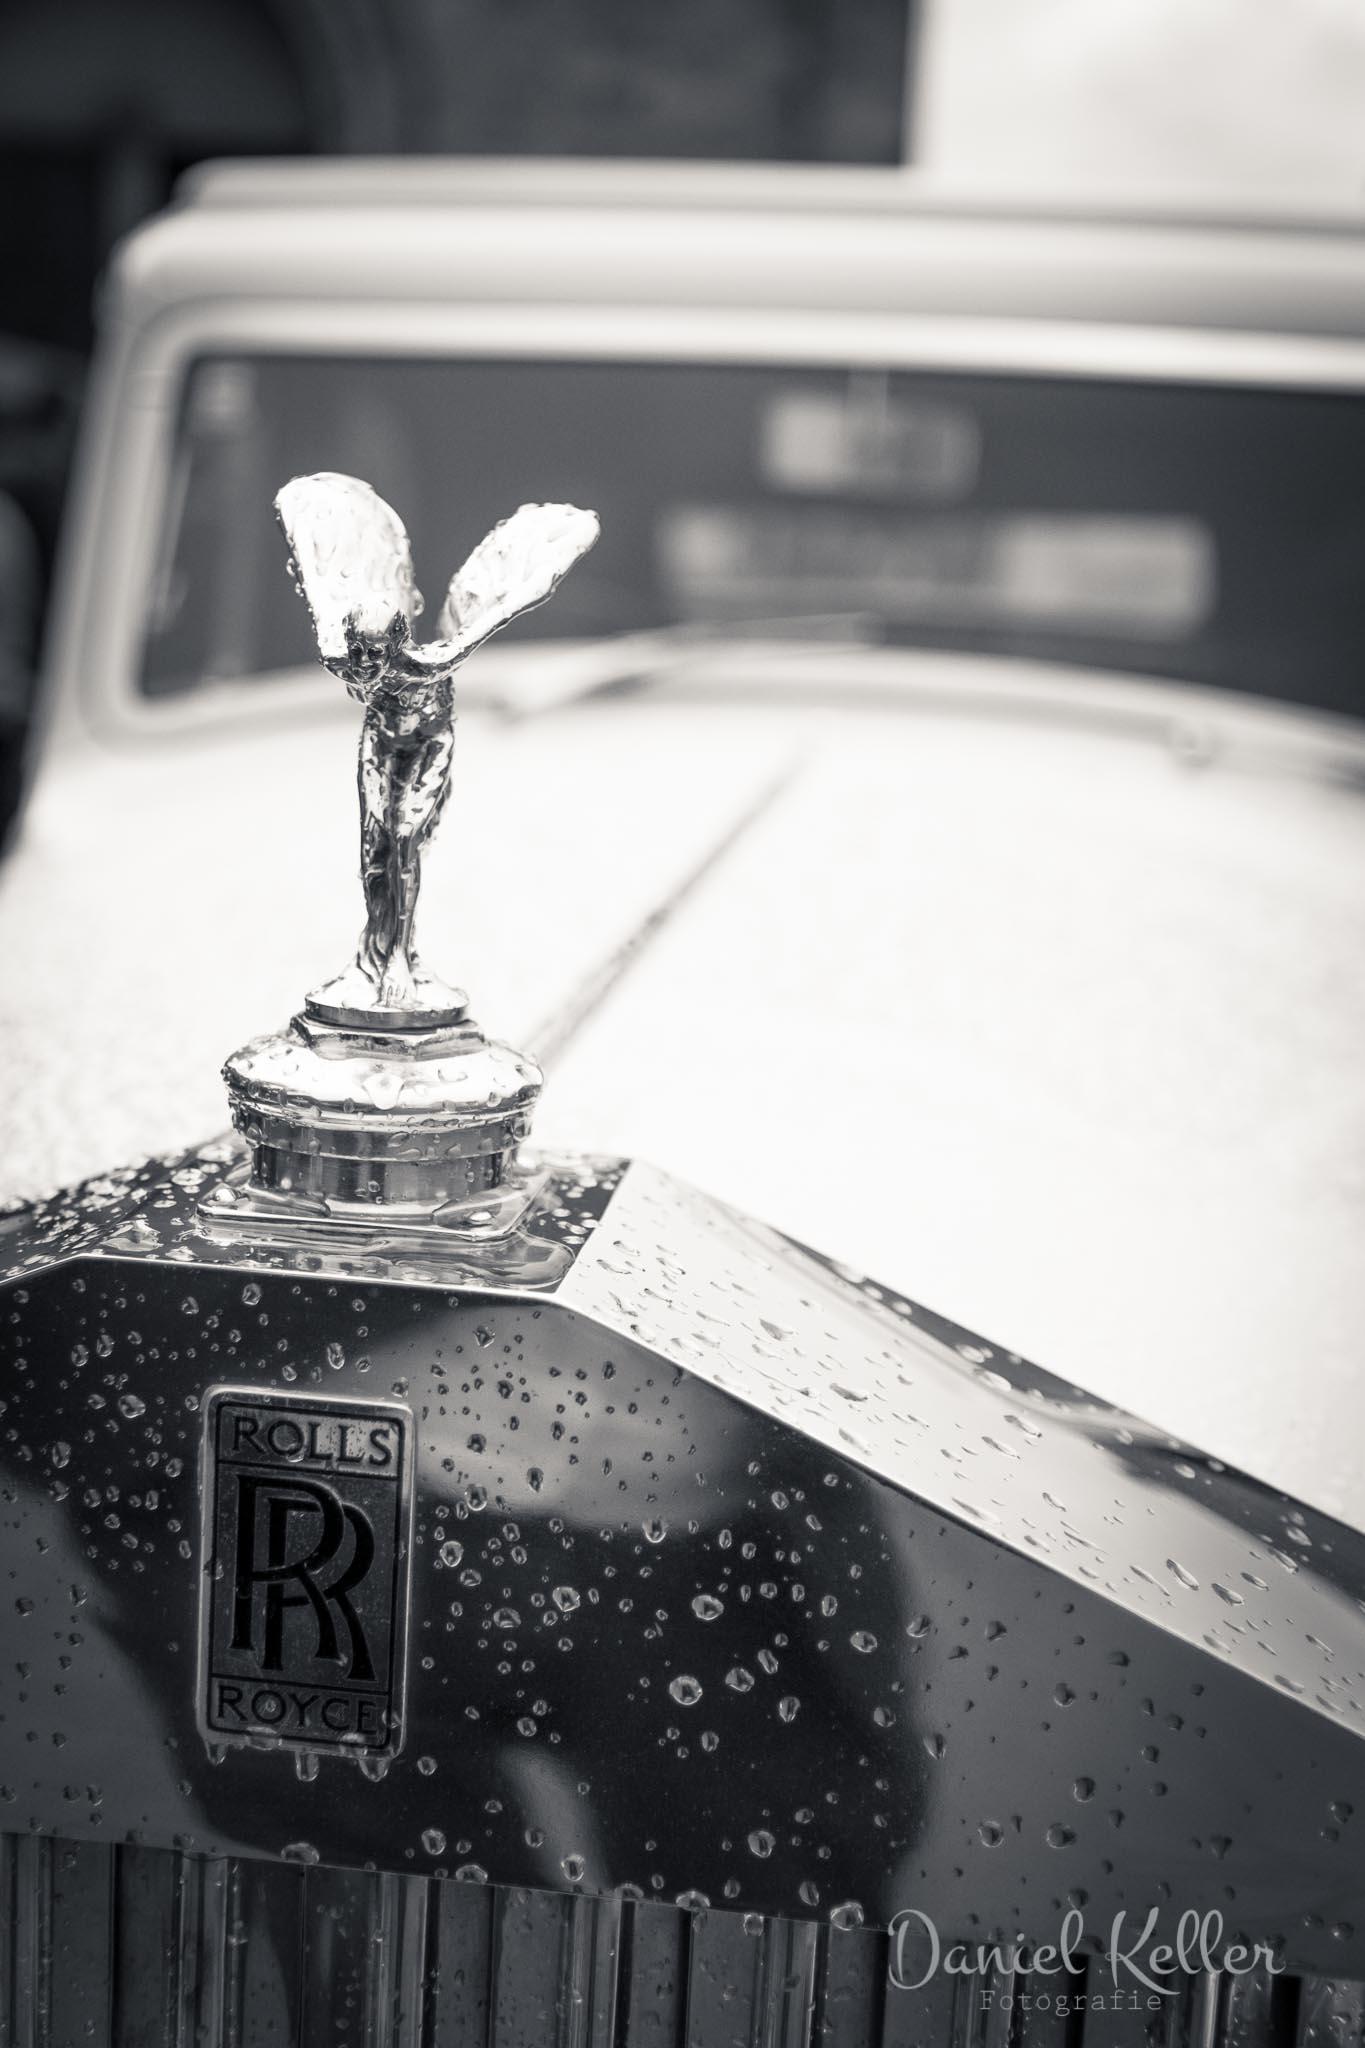 Rolls Royce Oldtimer / Daniel Keller Fotografie